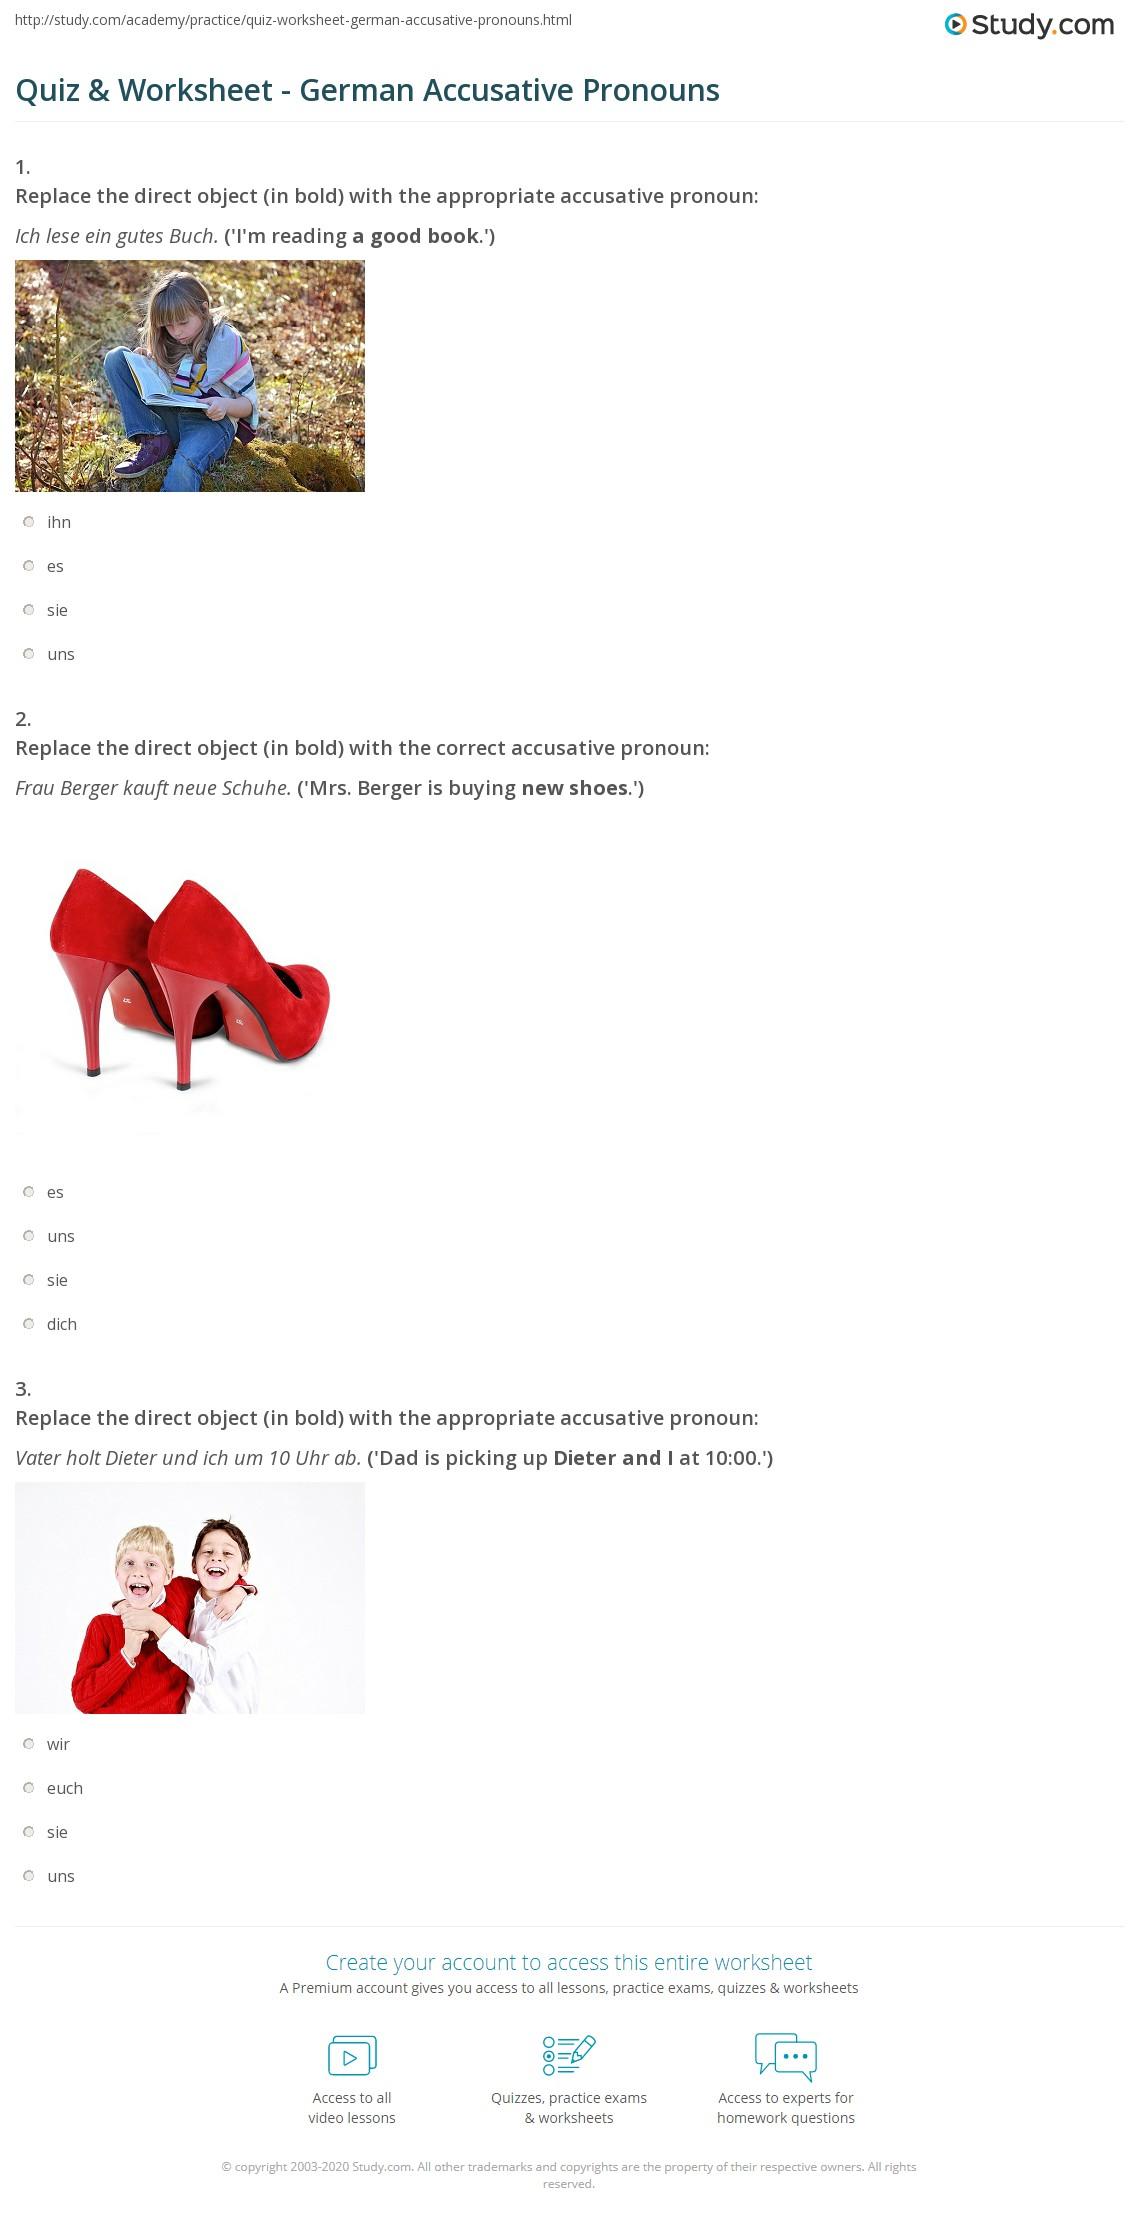 quiz worksheet german accusative pronouns. Black Bedroom Furniture Sets. Home Design Ideas